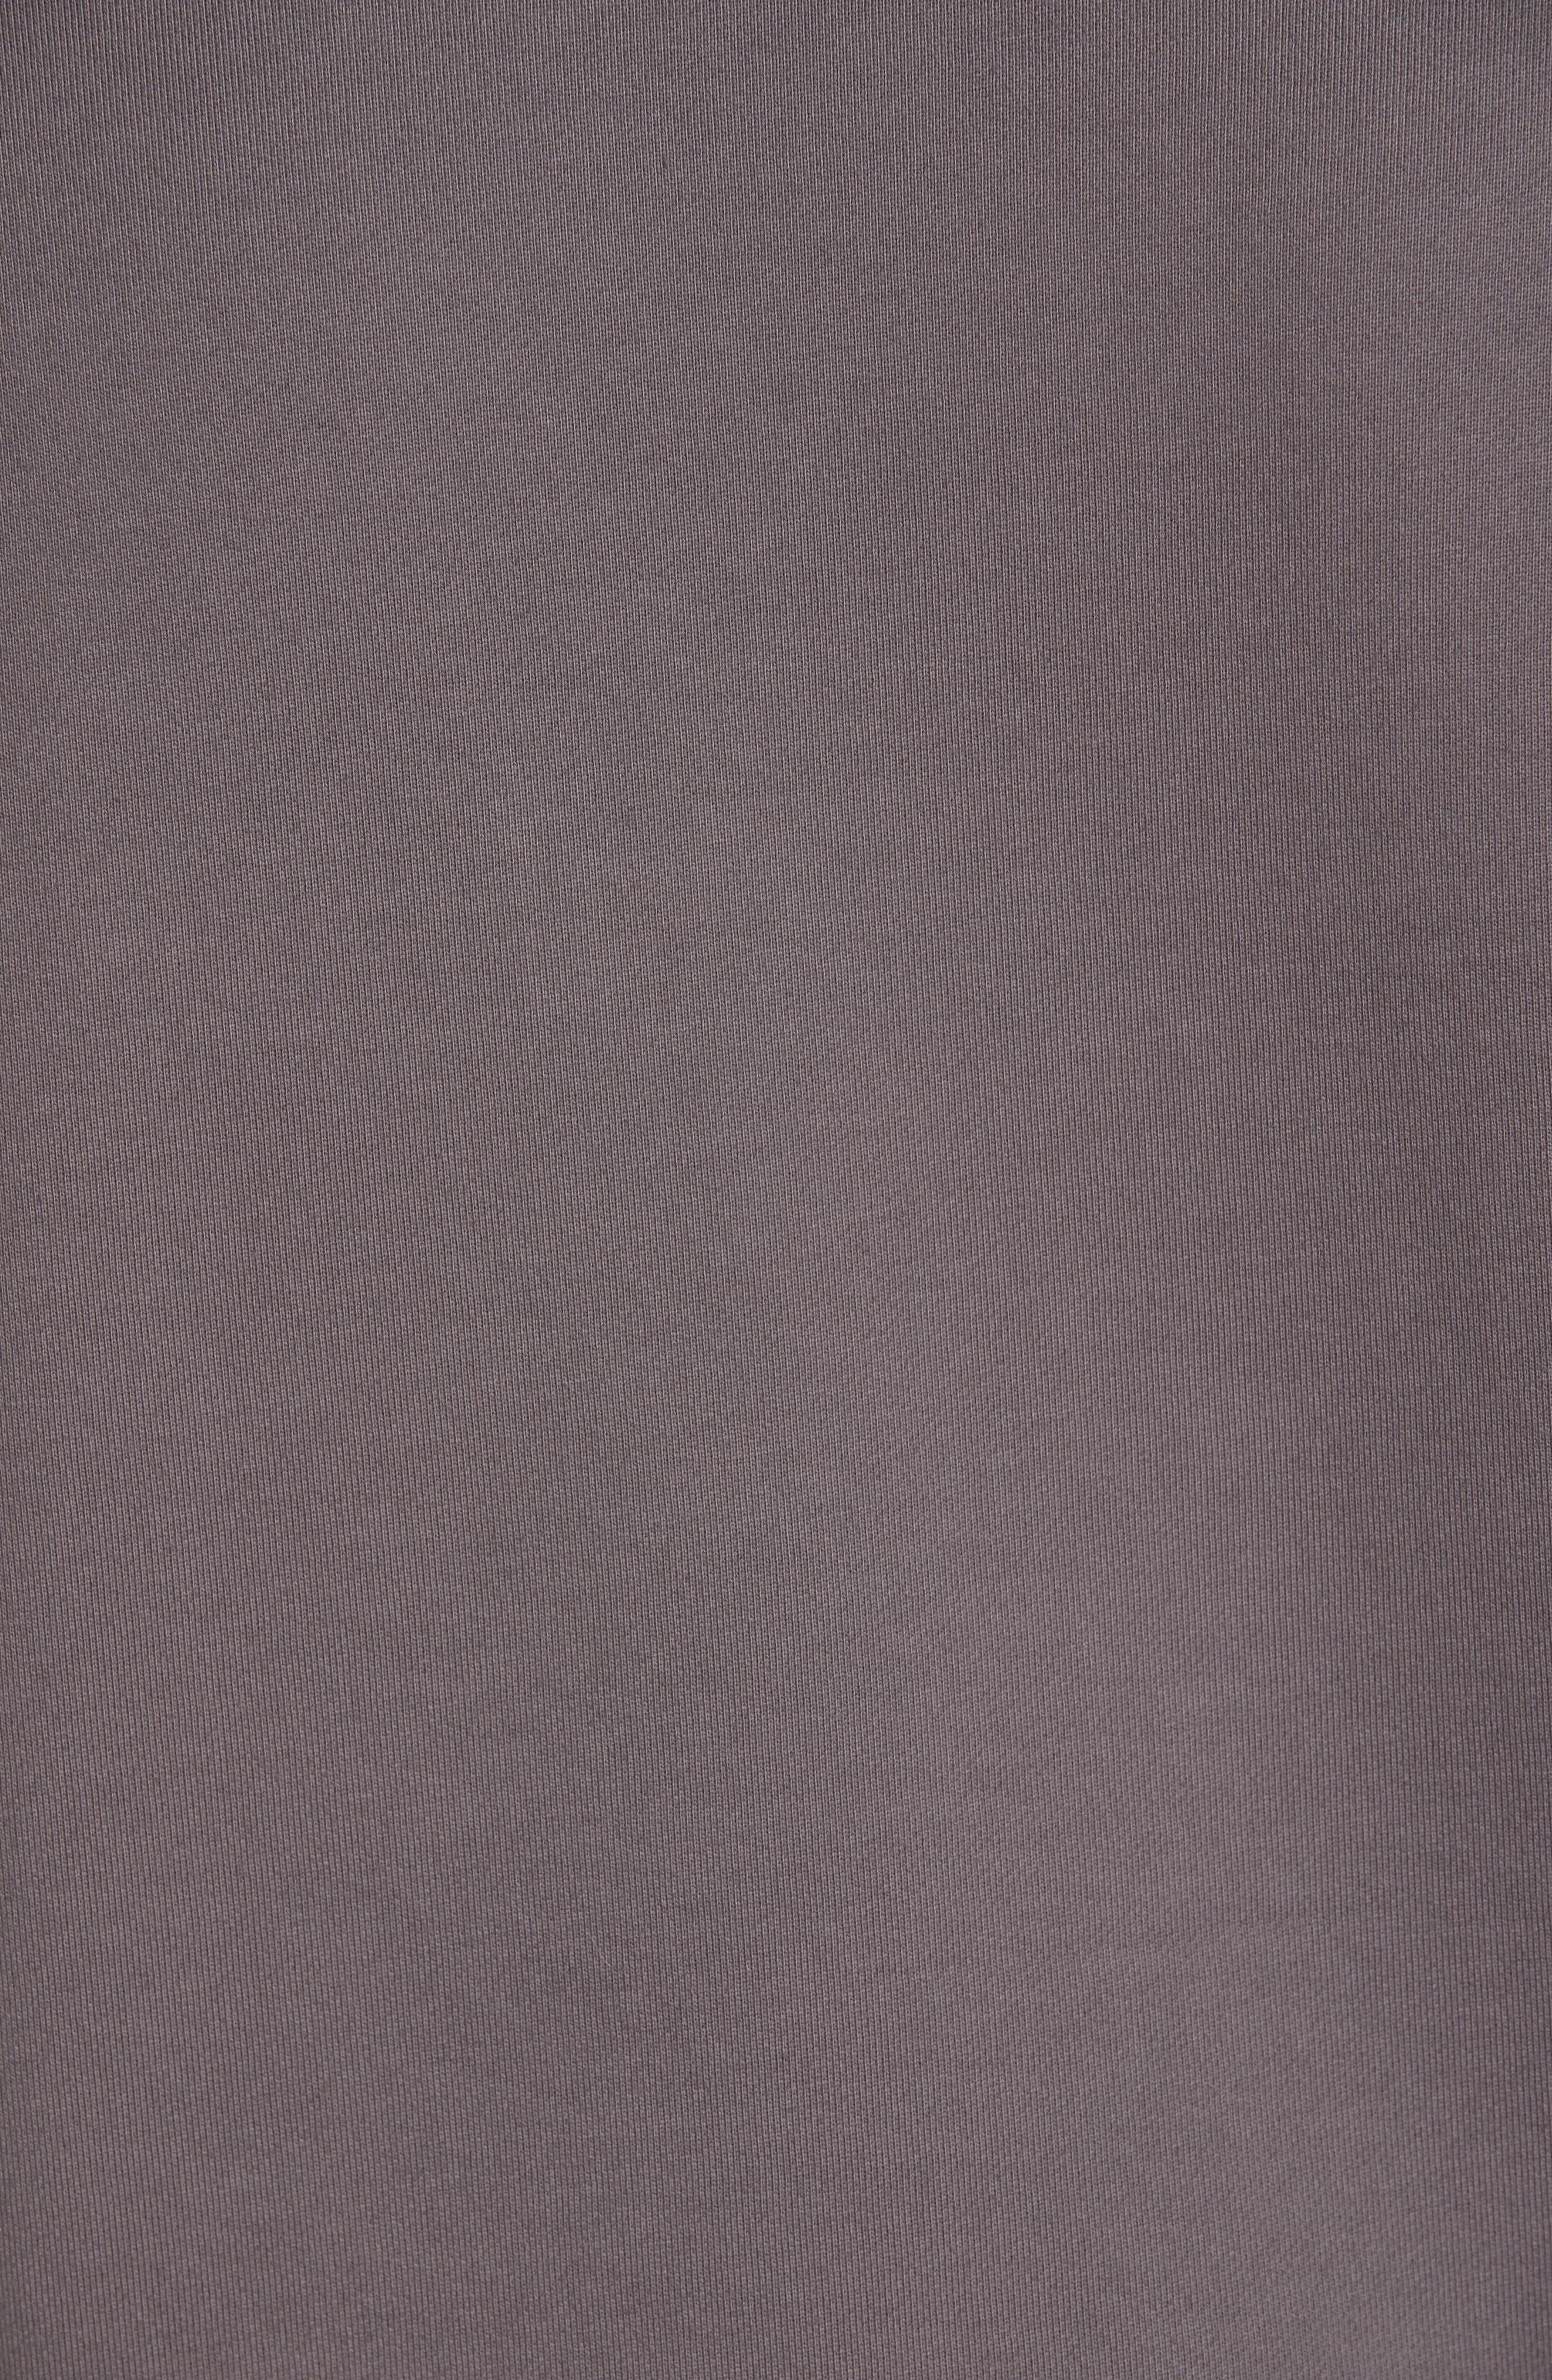 STONE ISLAND, Pocket Sweatshirt, Alternate thumbnail 5, color, BLUE